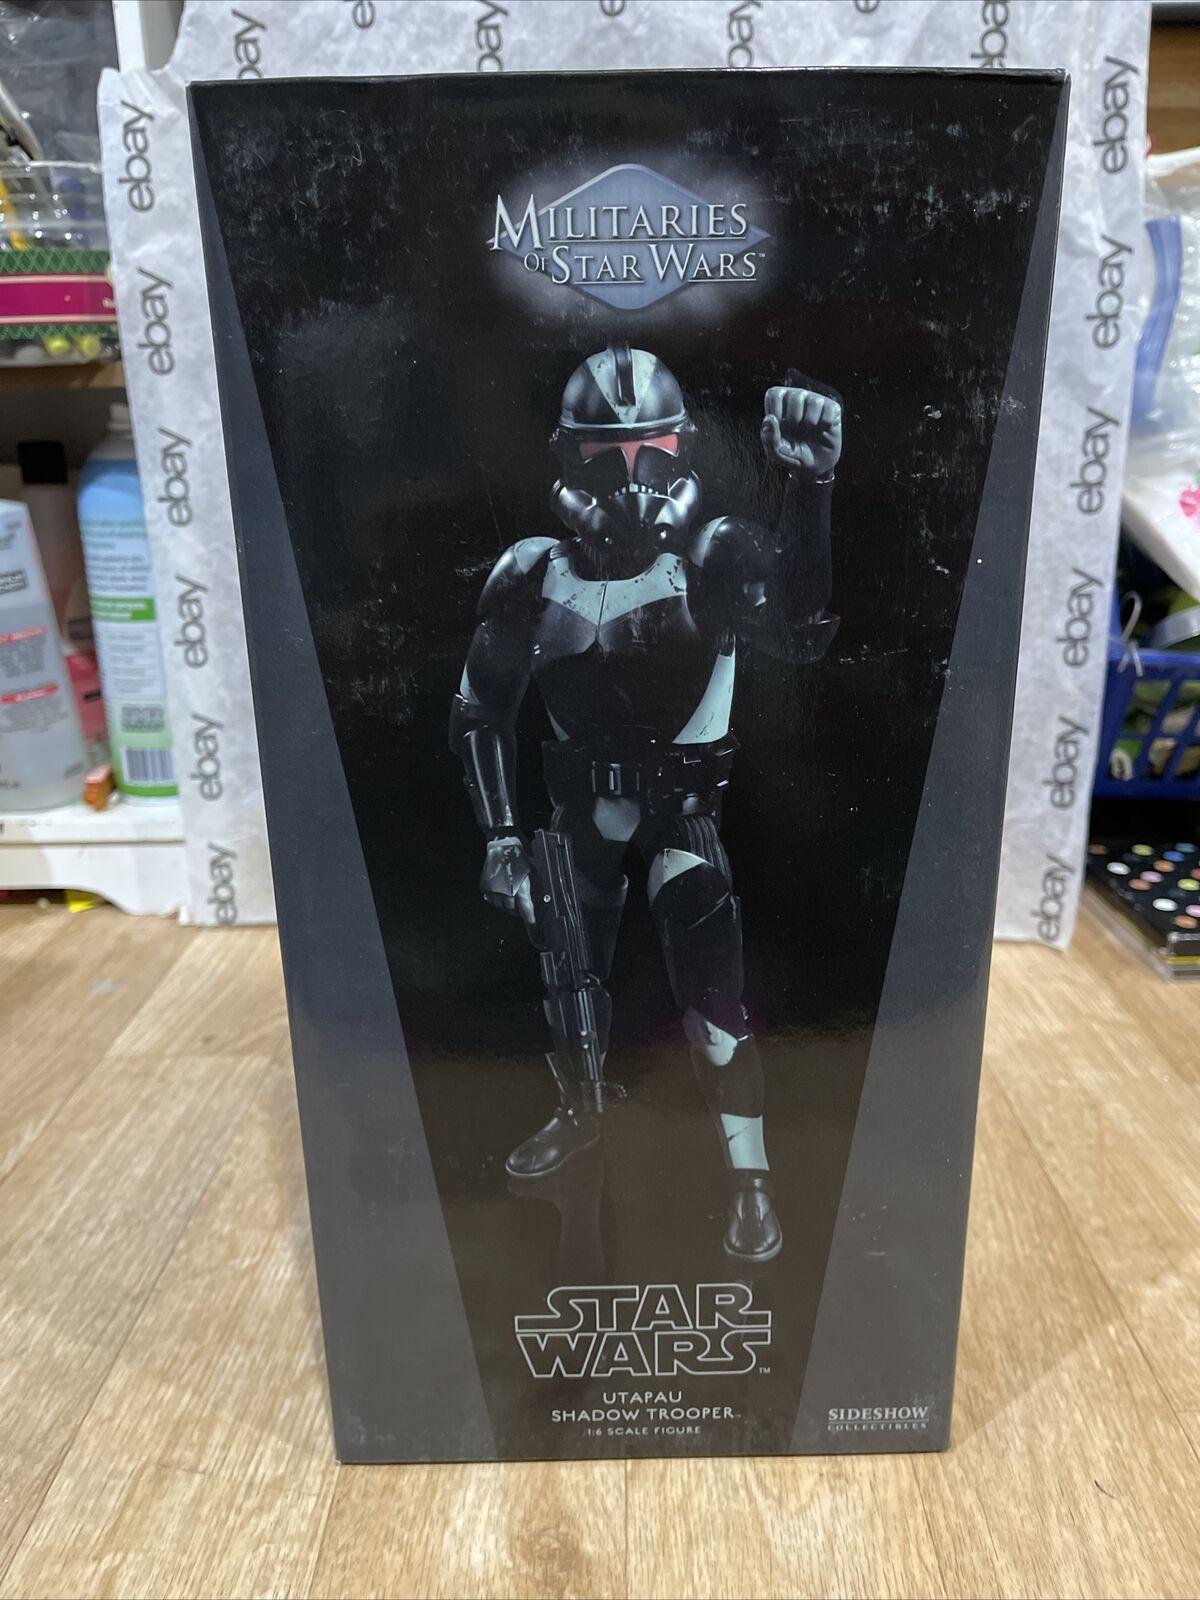 Sideshow Collectibles 1/6 figure Utapau Shadow Trooper Militaries of Star Wars on eBay thumbnail